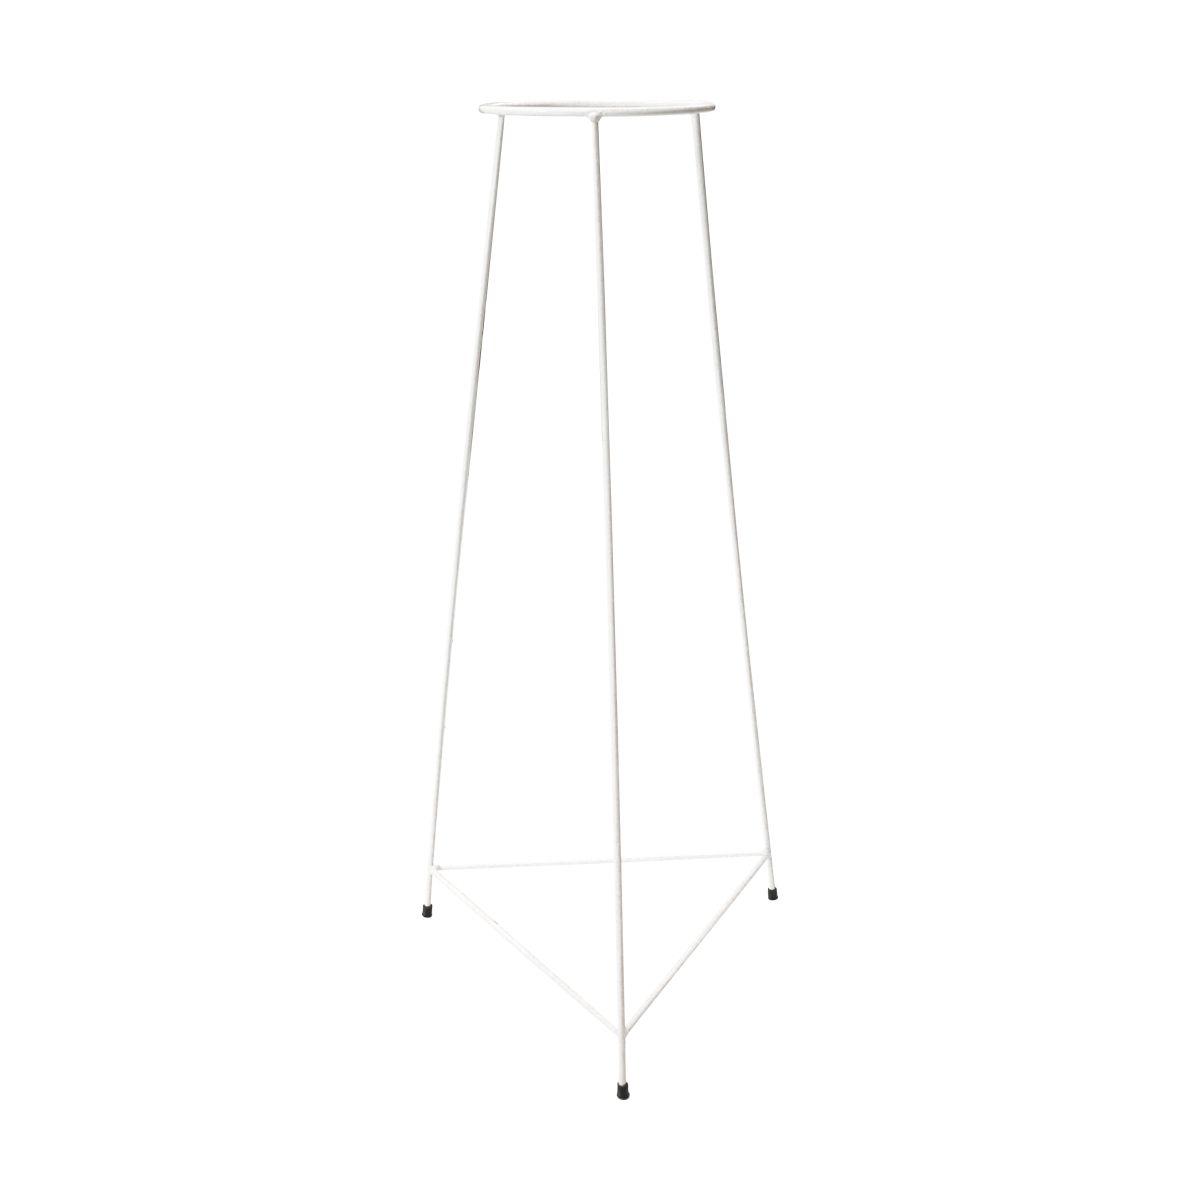 Suporte Tripé Triangular Branco 80cm para Vaso Autoirigável Grande N04 Raiz